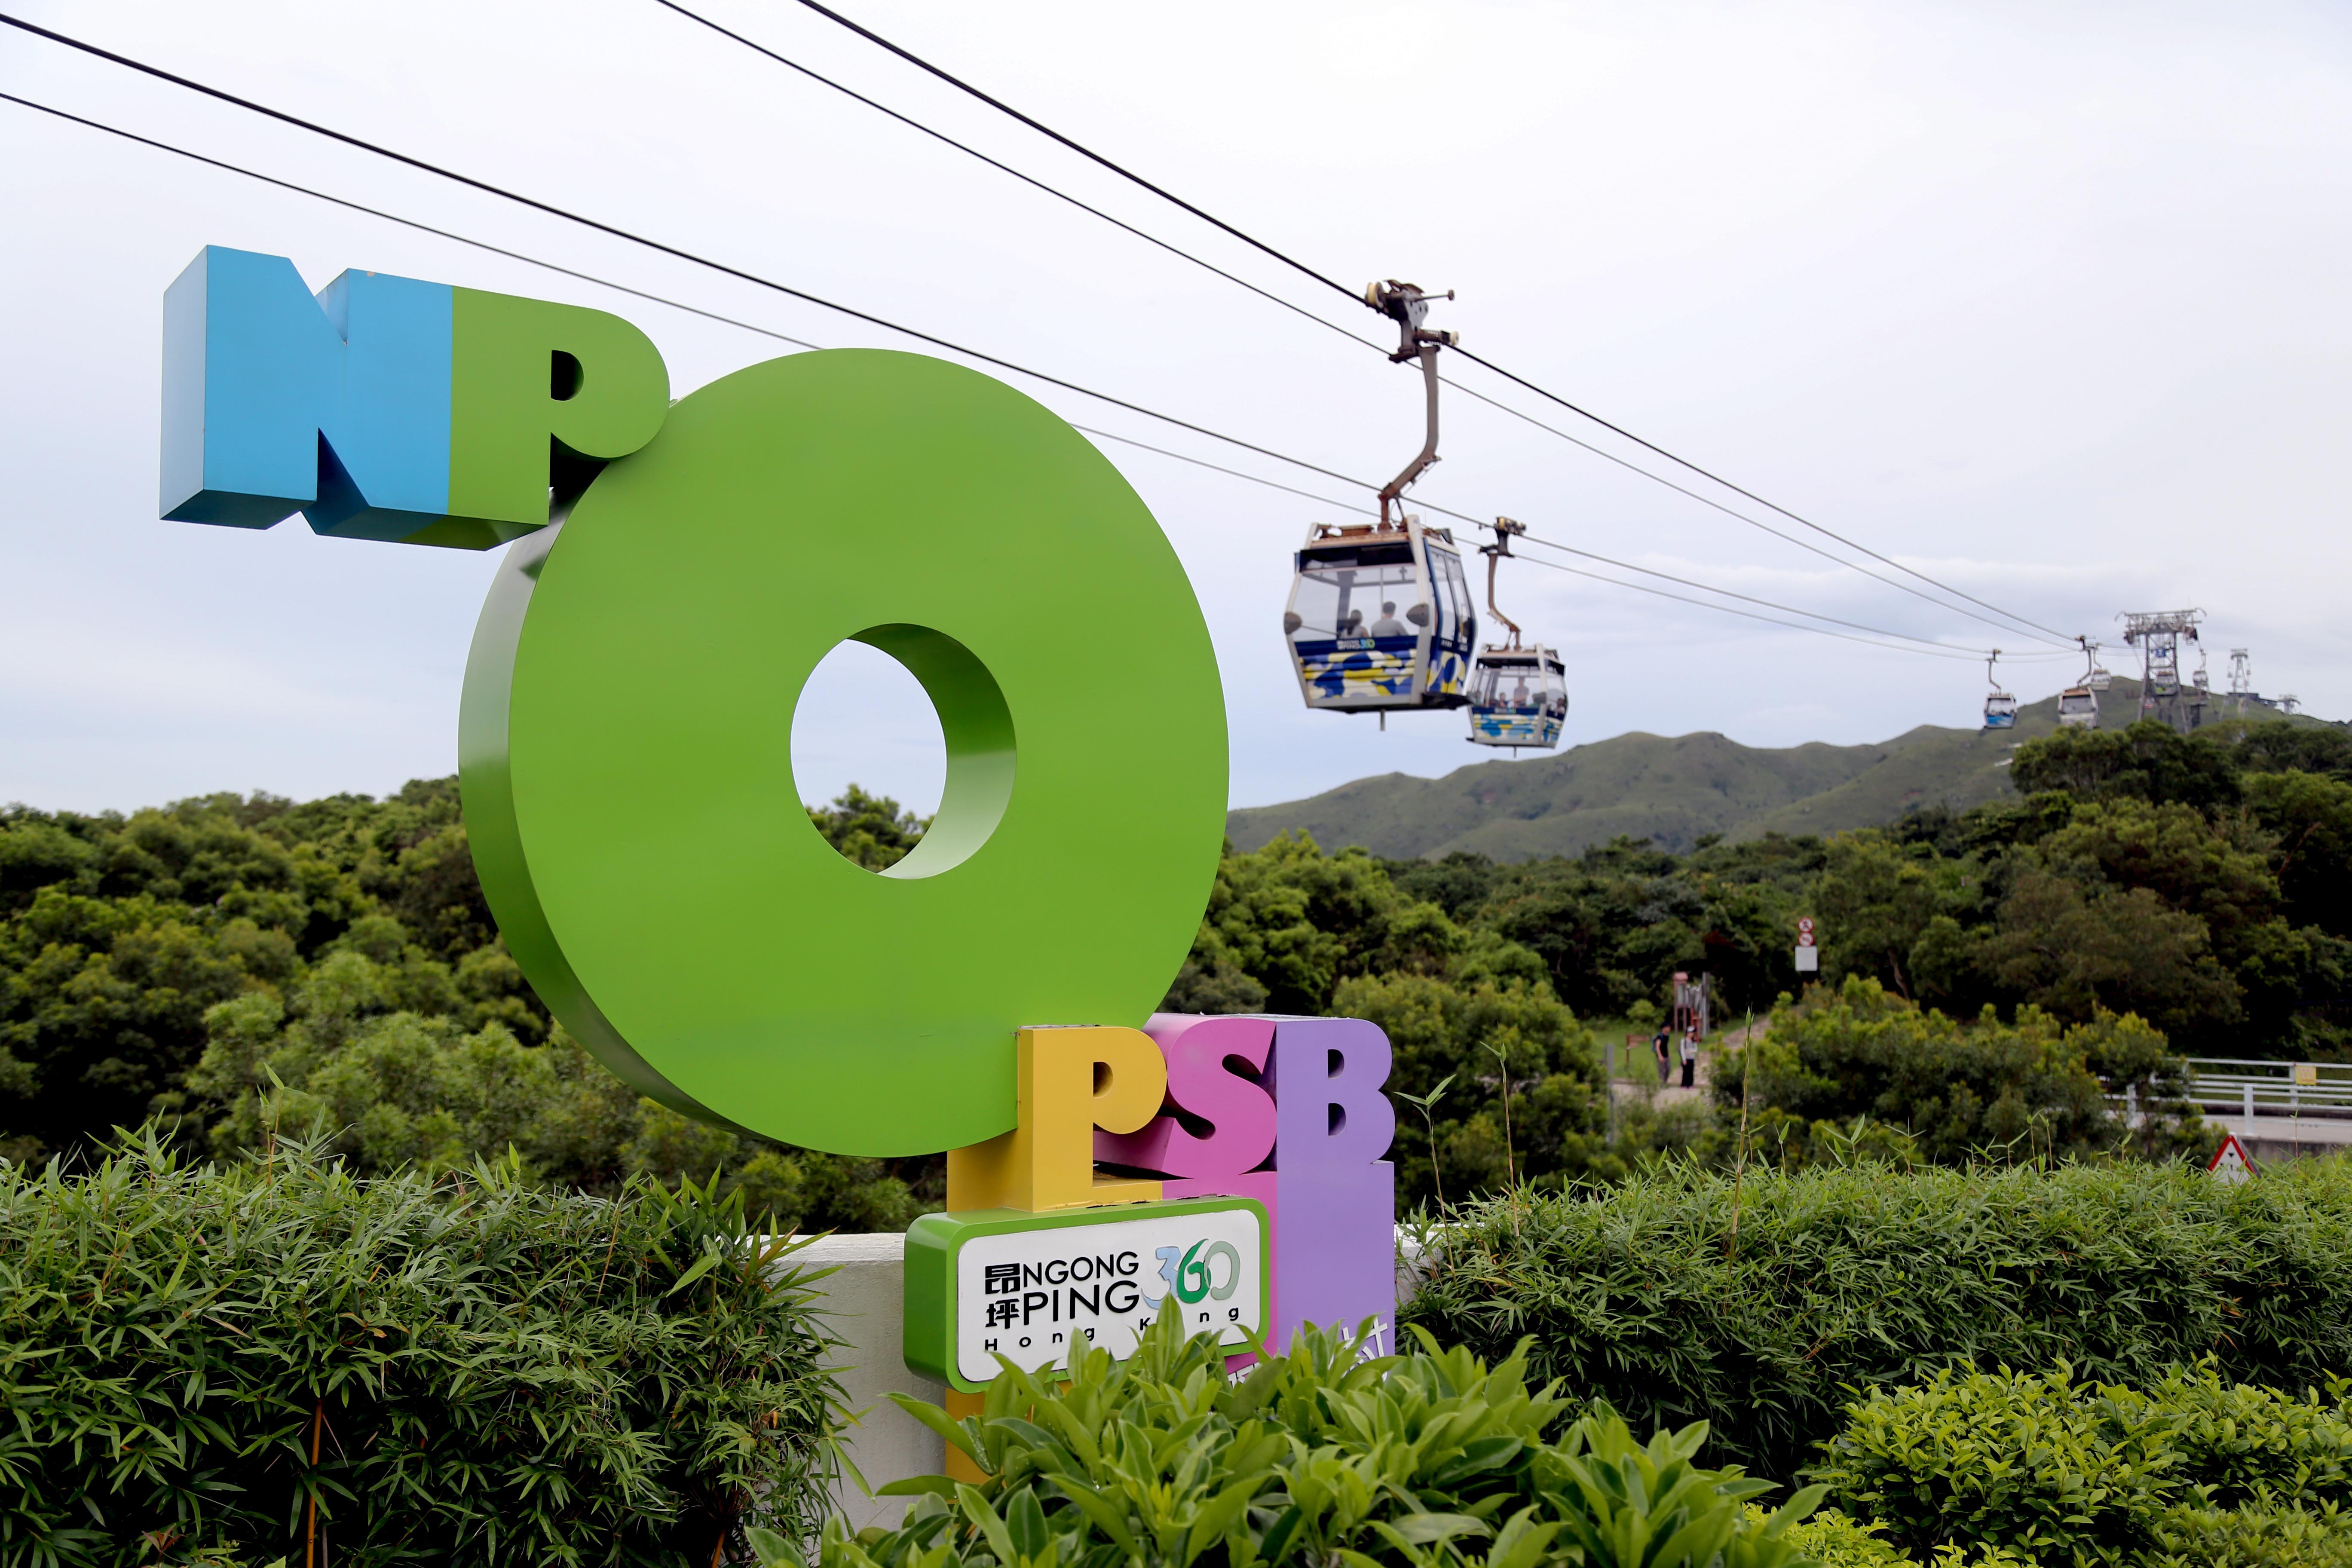 Cable car ride to Lantau Island — Hong Kong's Cultural, spiritual and heritage walk